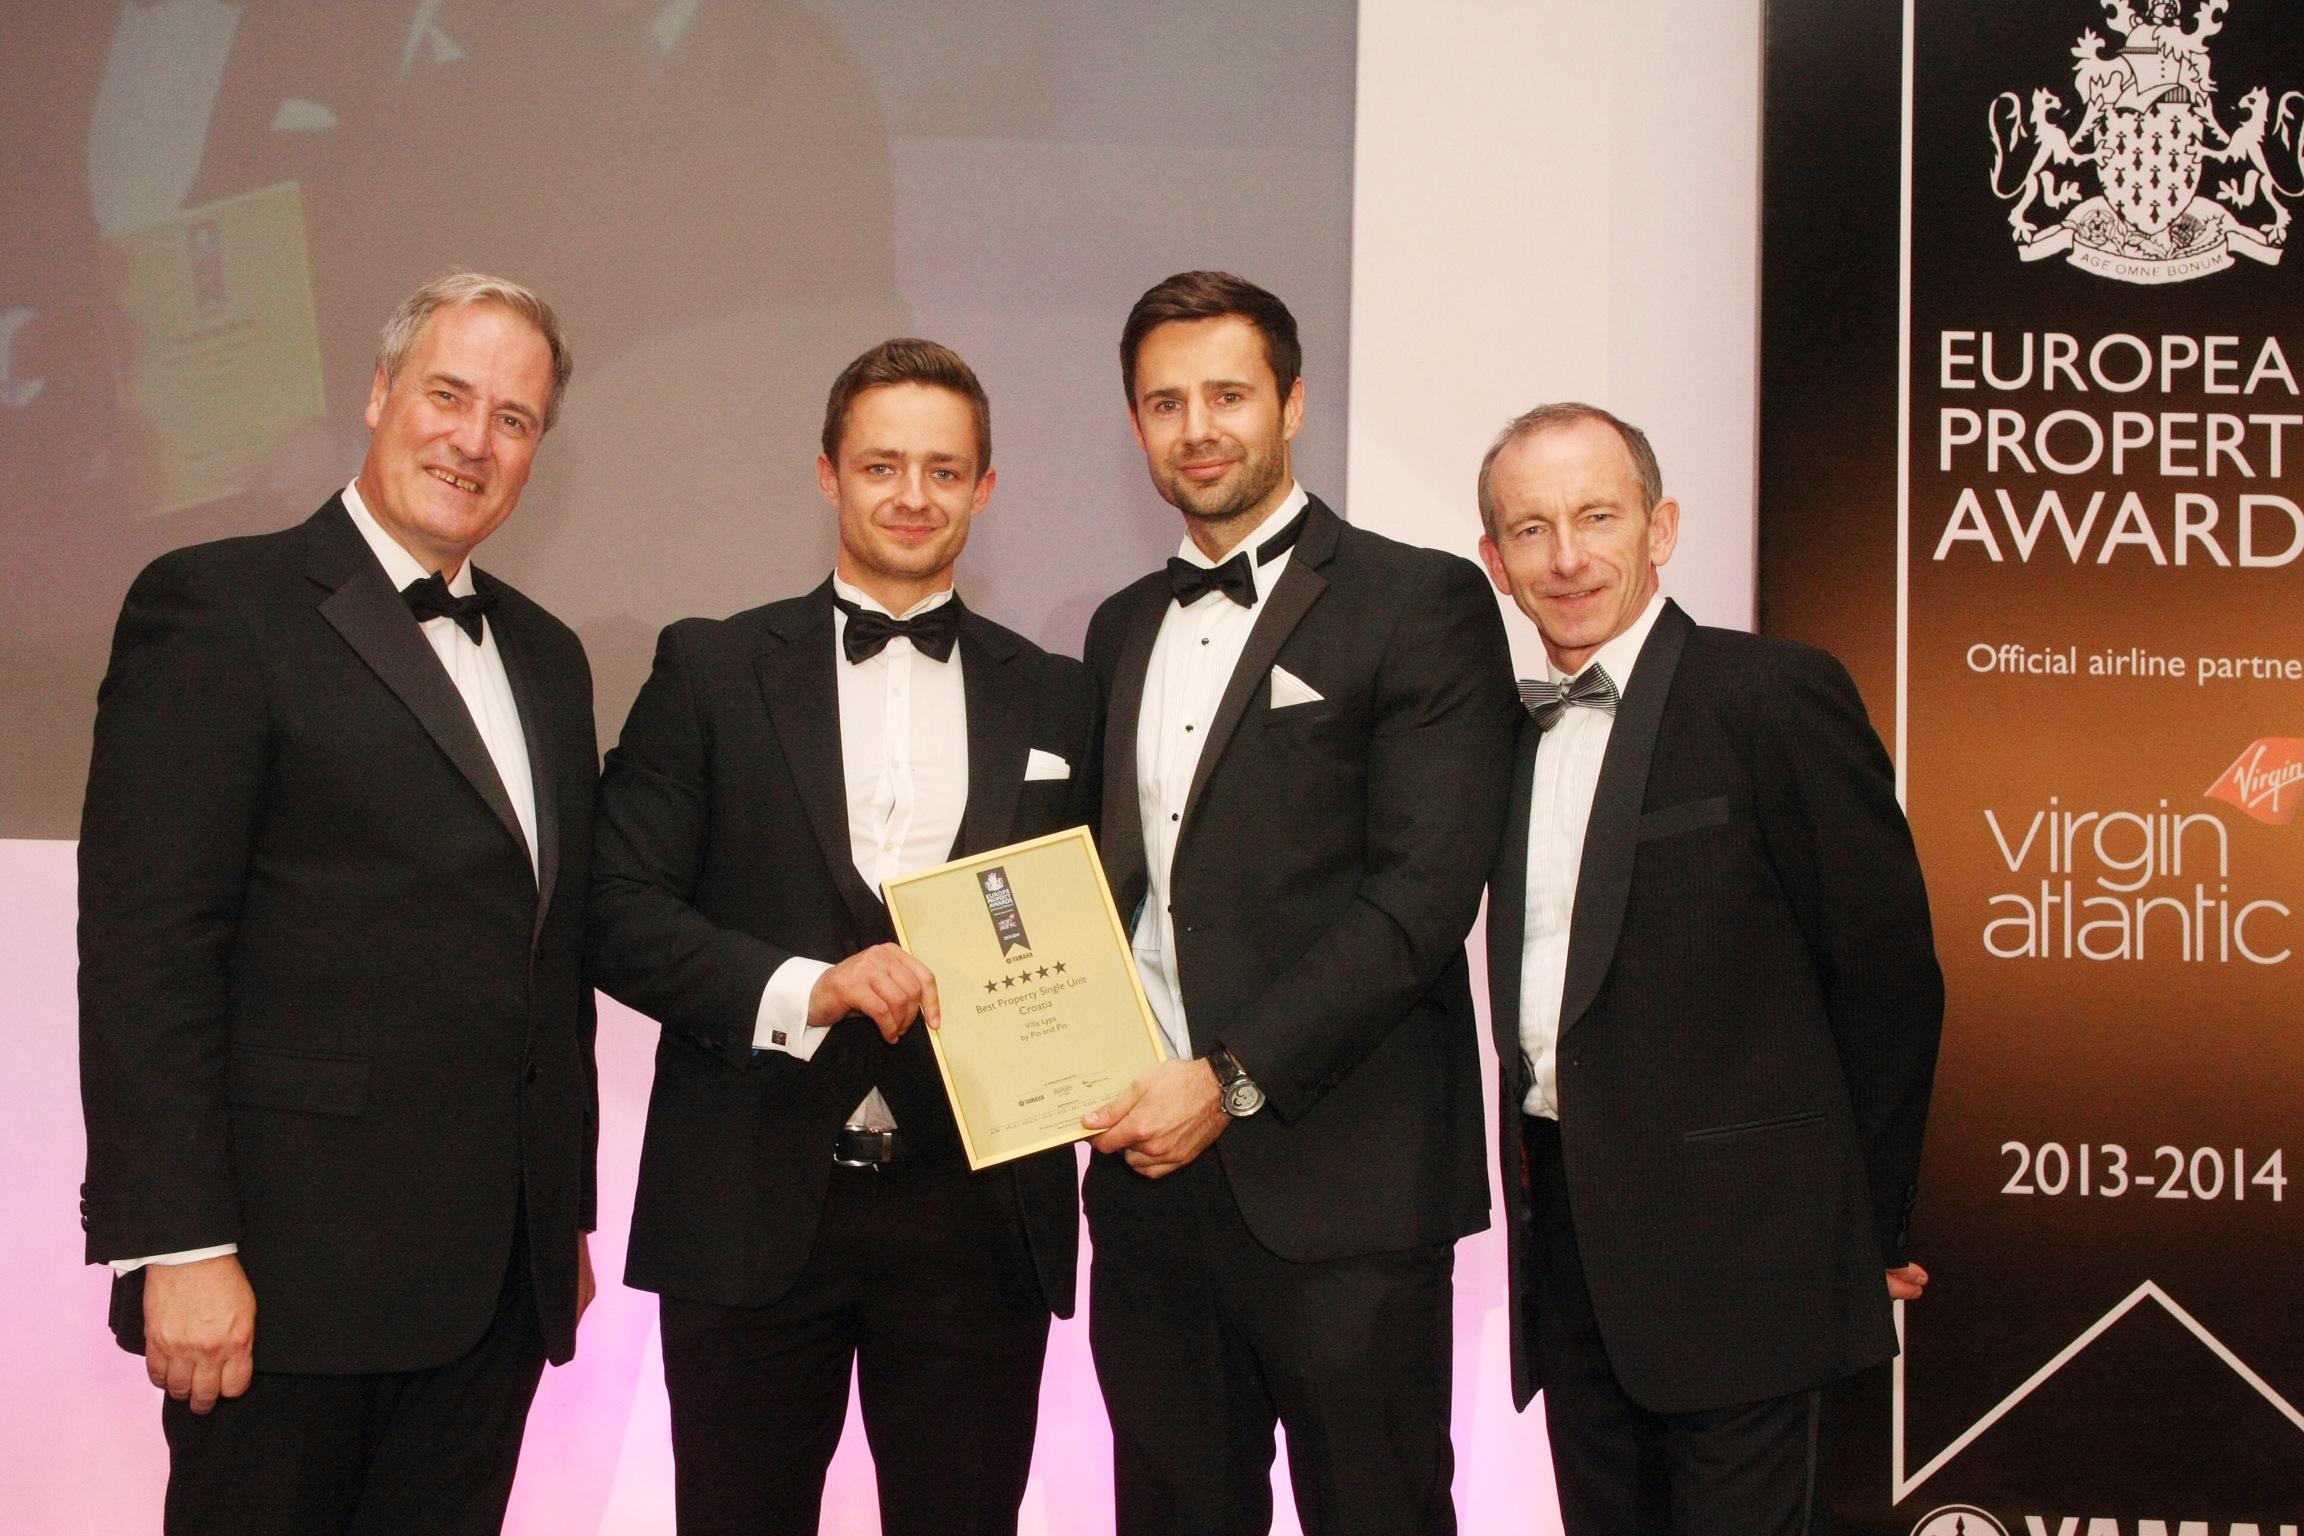 Pin & Pin win an International Property Award